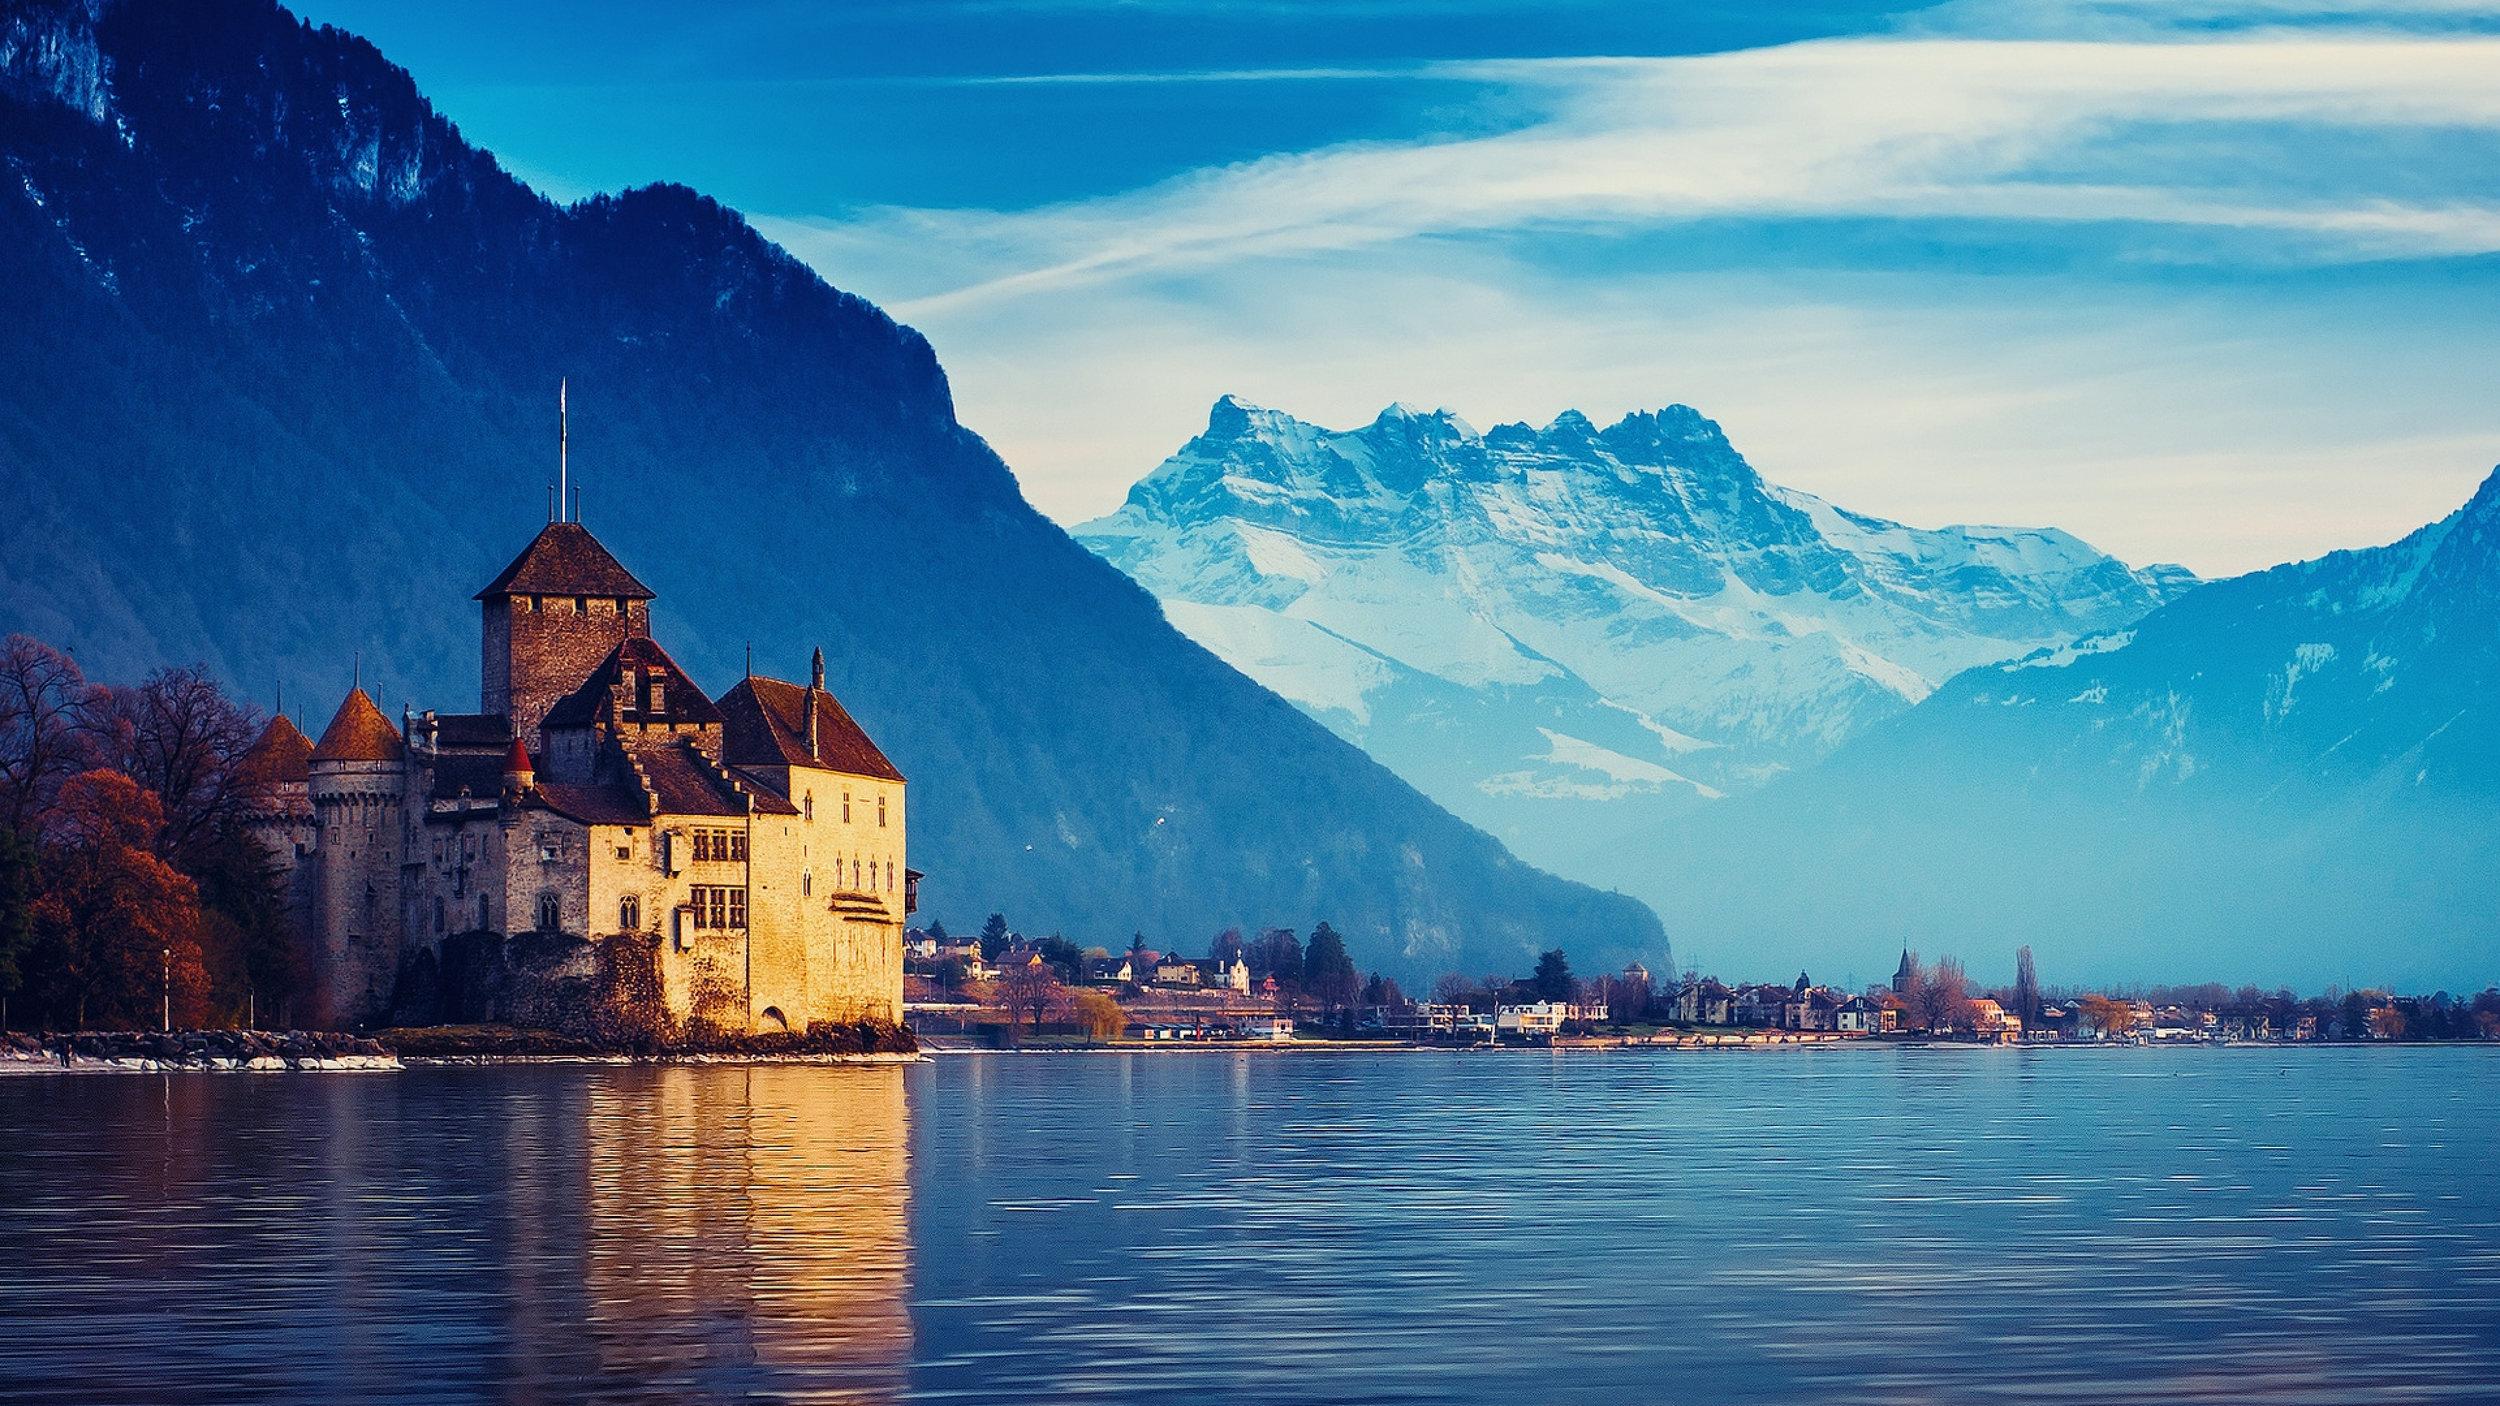 switzerland_lake_geneva_city_mountains_snow_69357_3840x2160.jpg